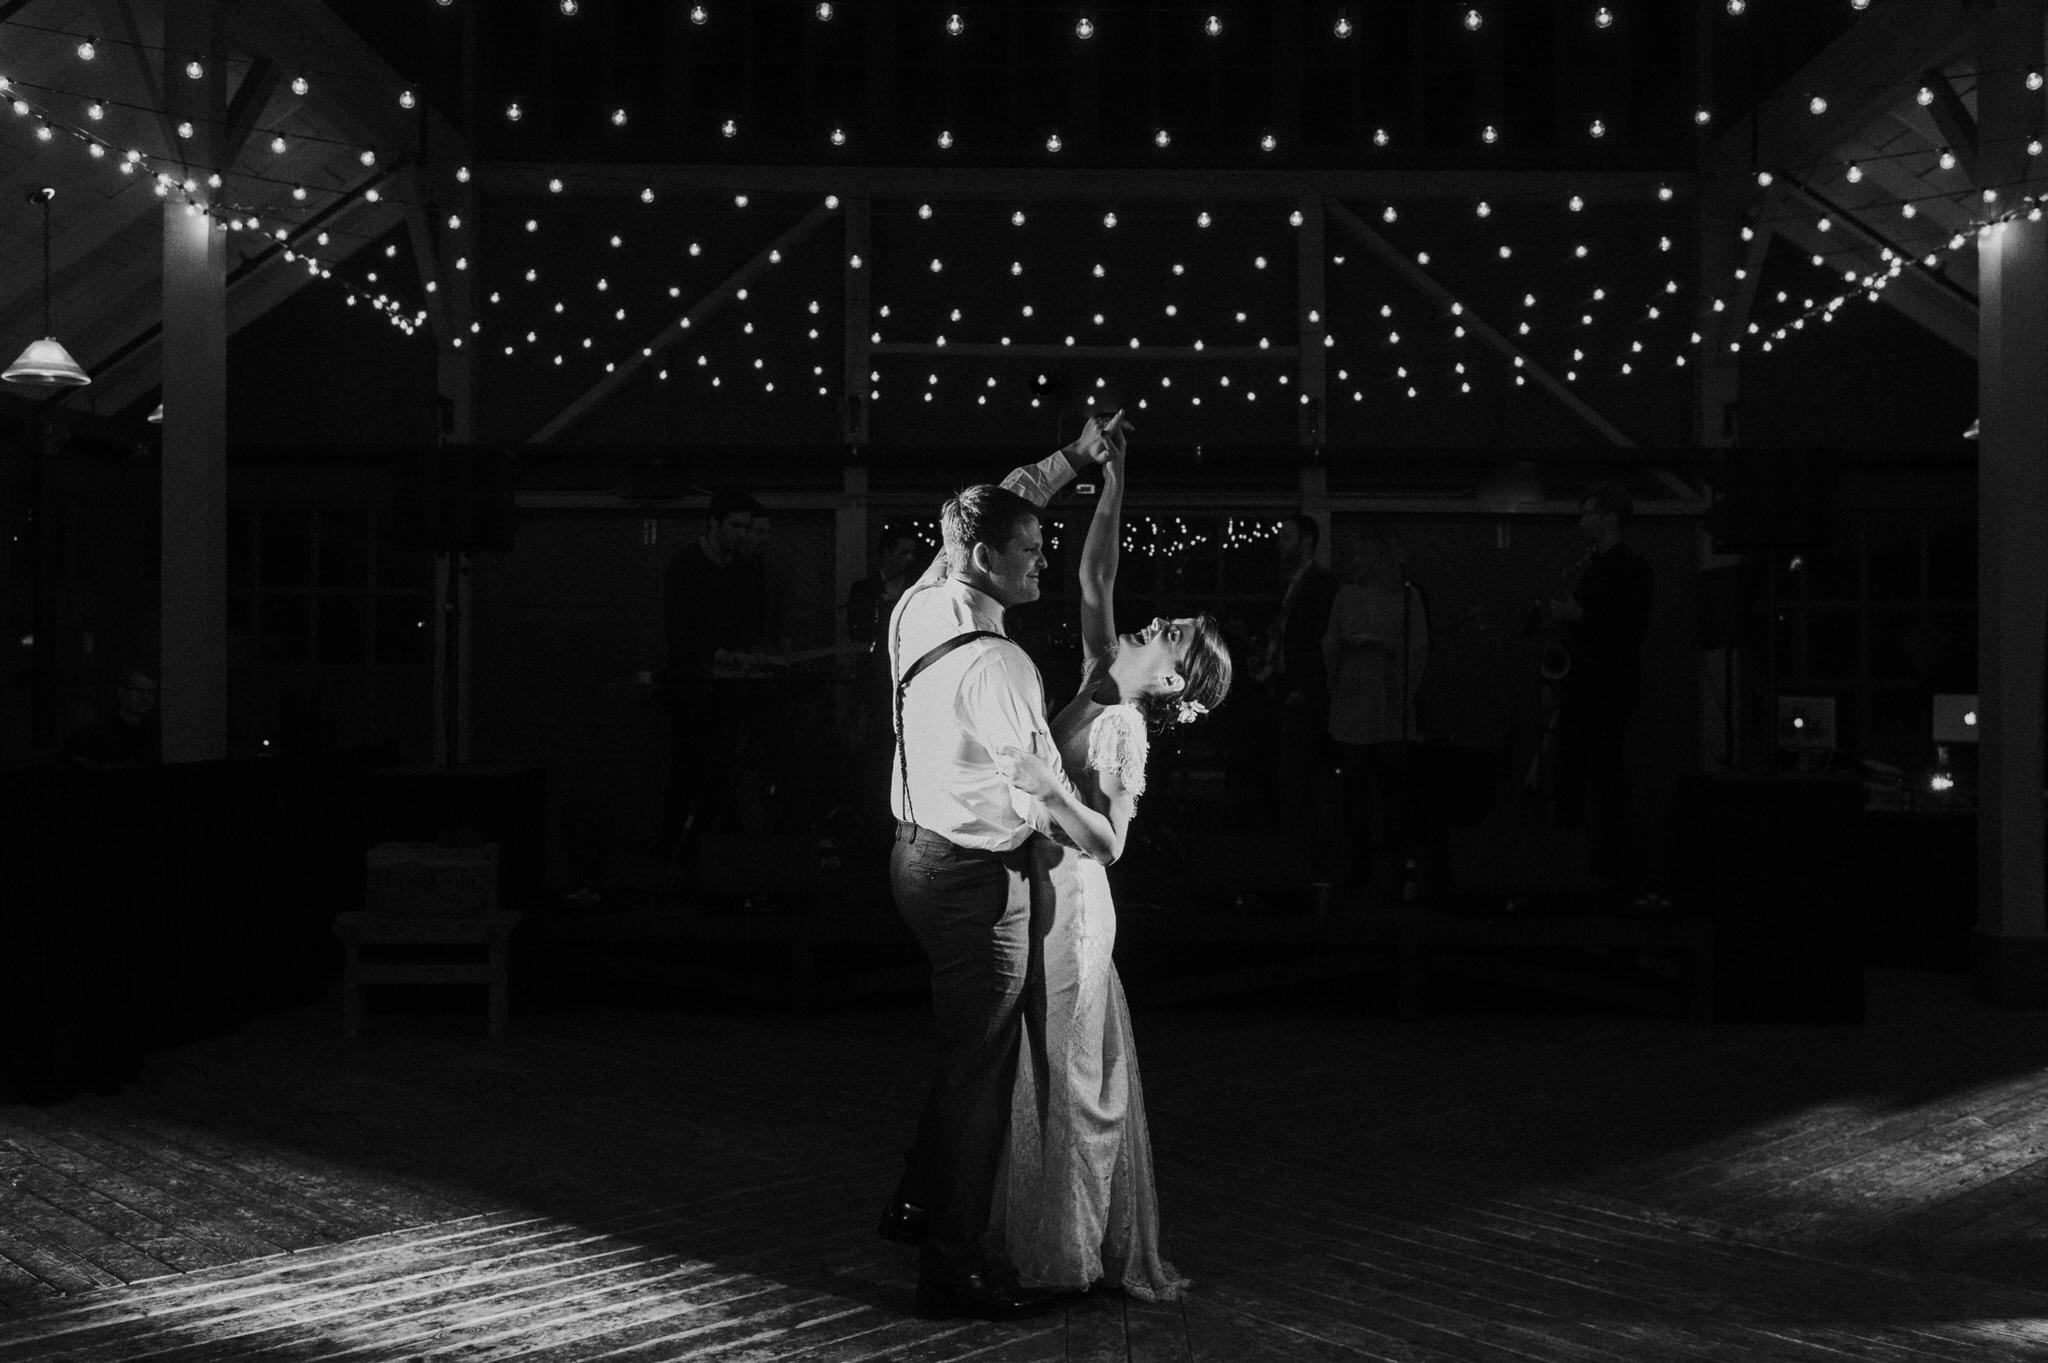 scarletoneillphotography_weddingphotography_prince edward county weddings171.JPG